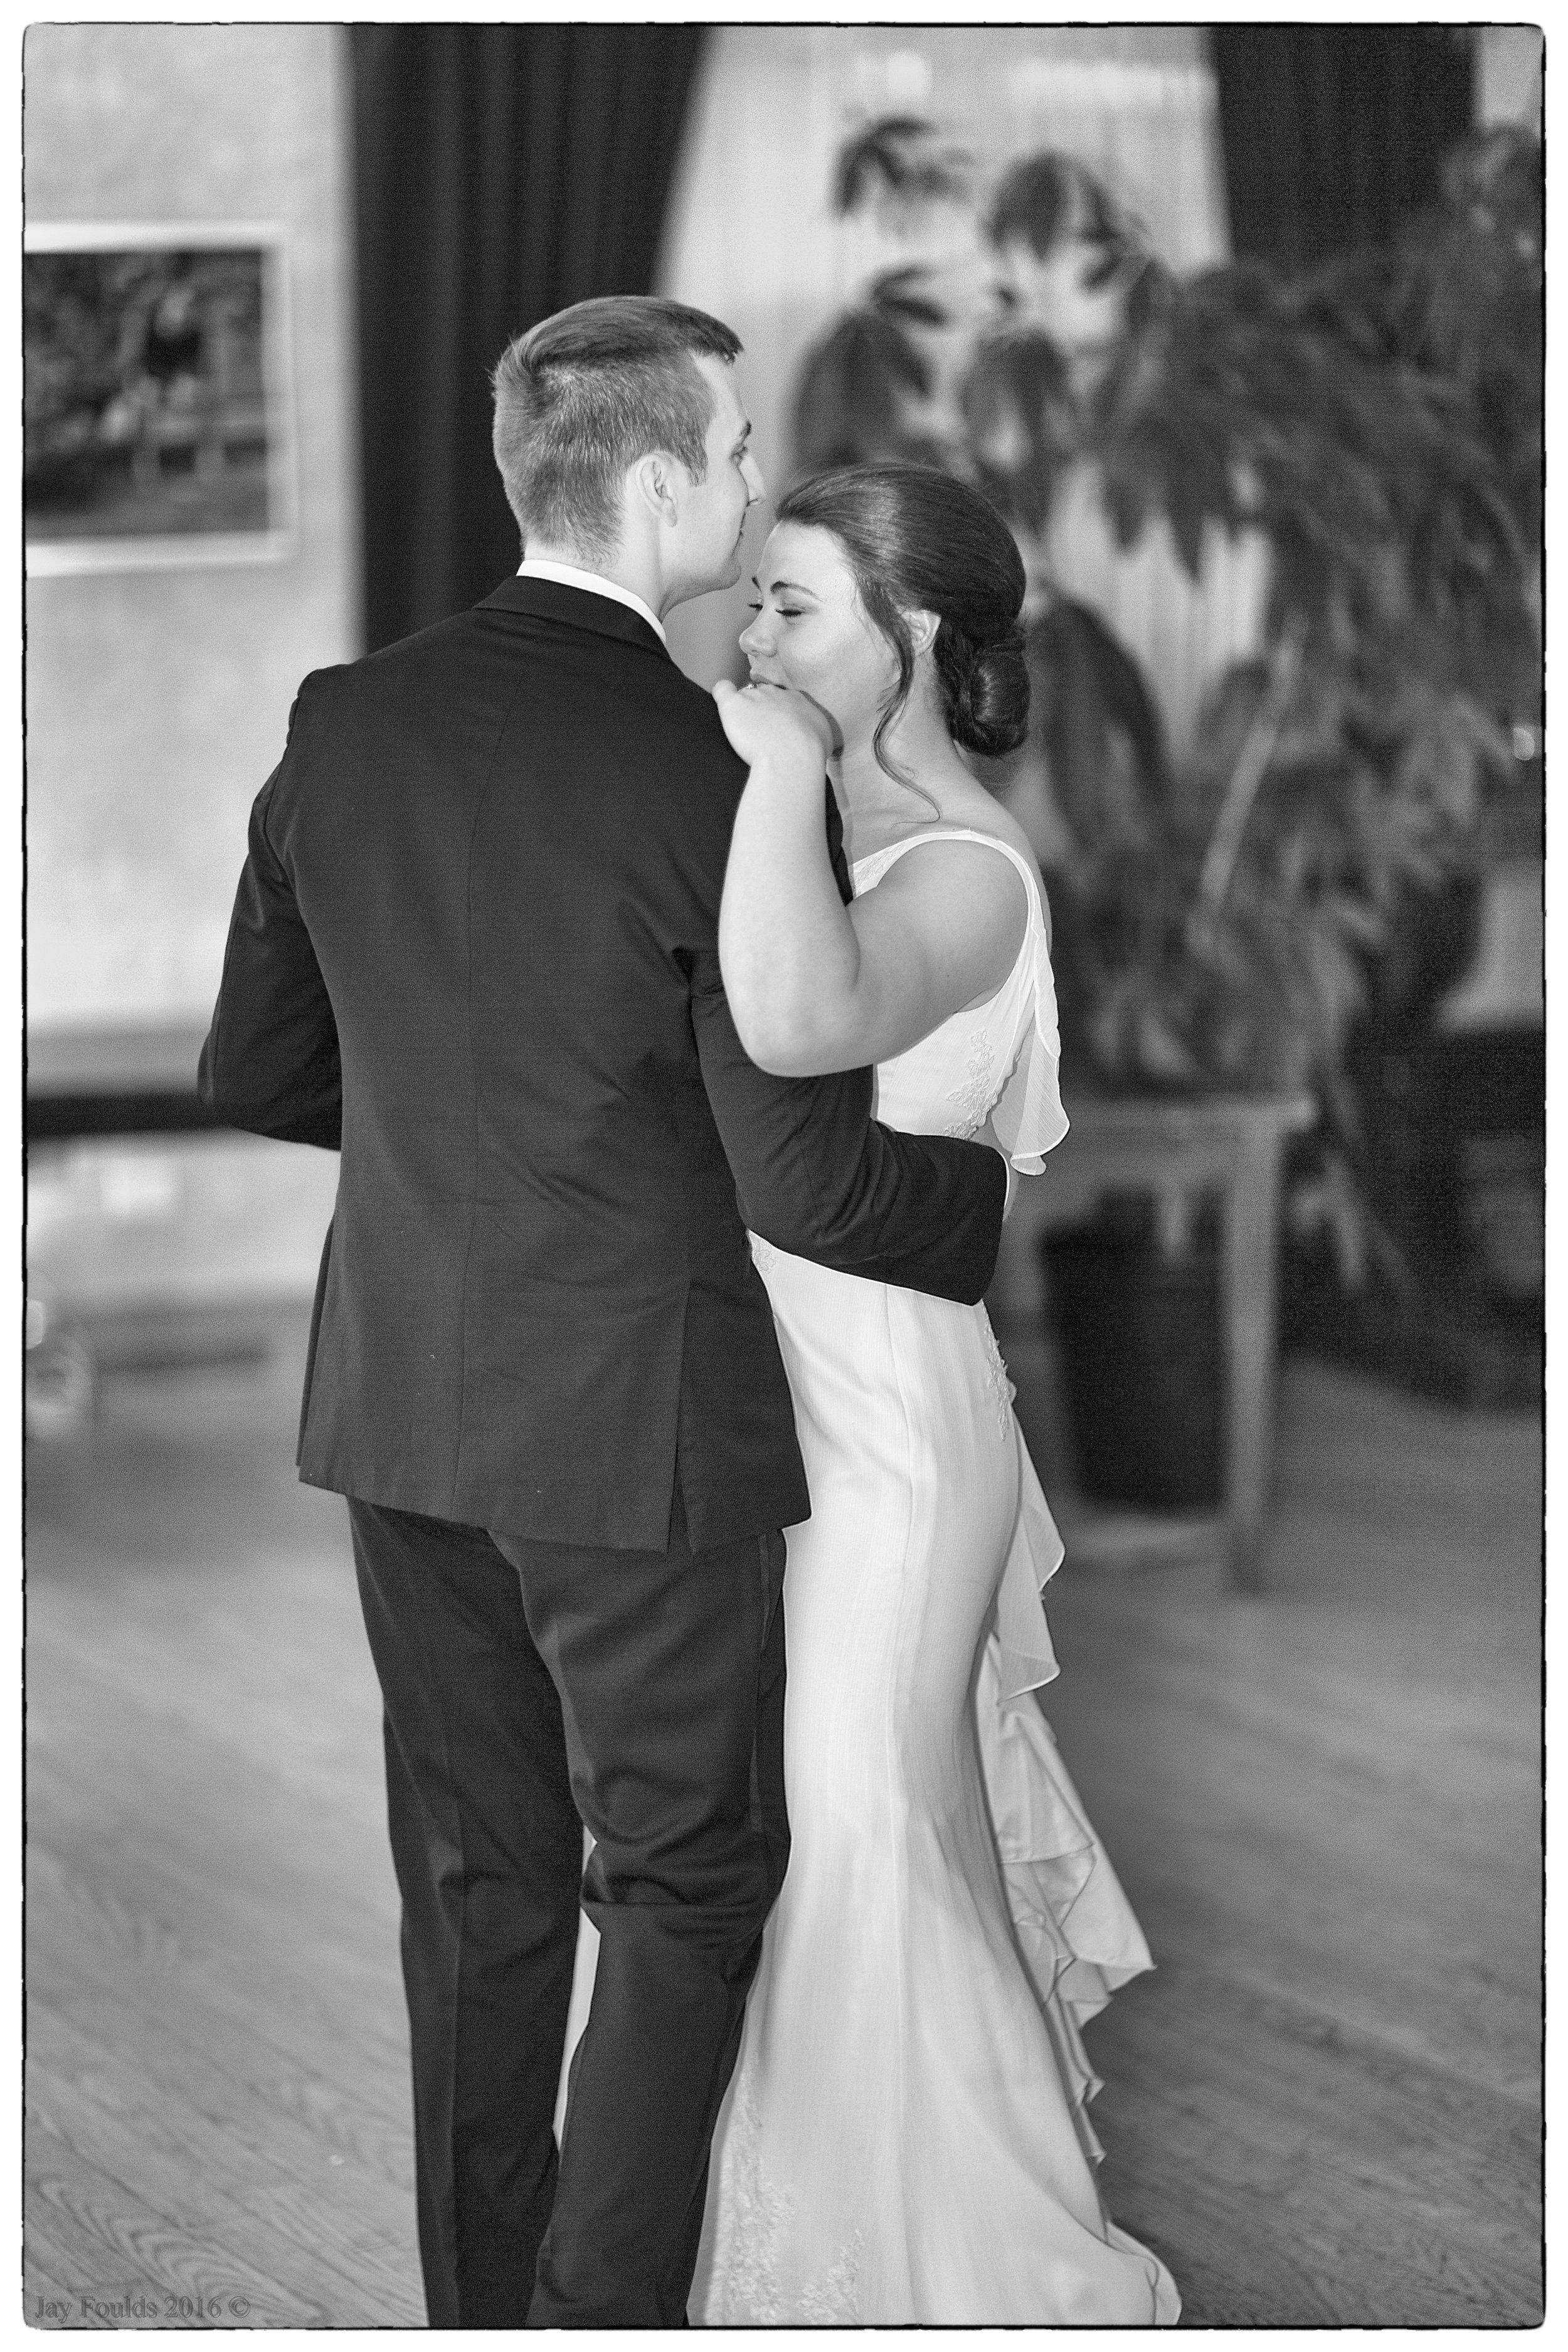 Halos - Jean Wedding - 02 July 2016 - The Celebration - 186 (elegance).JPG